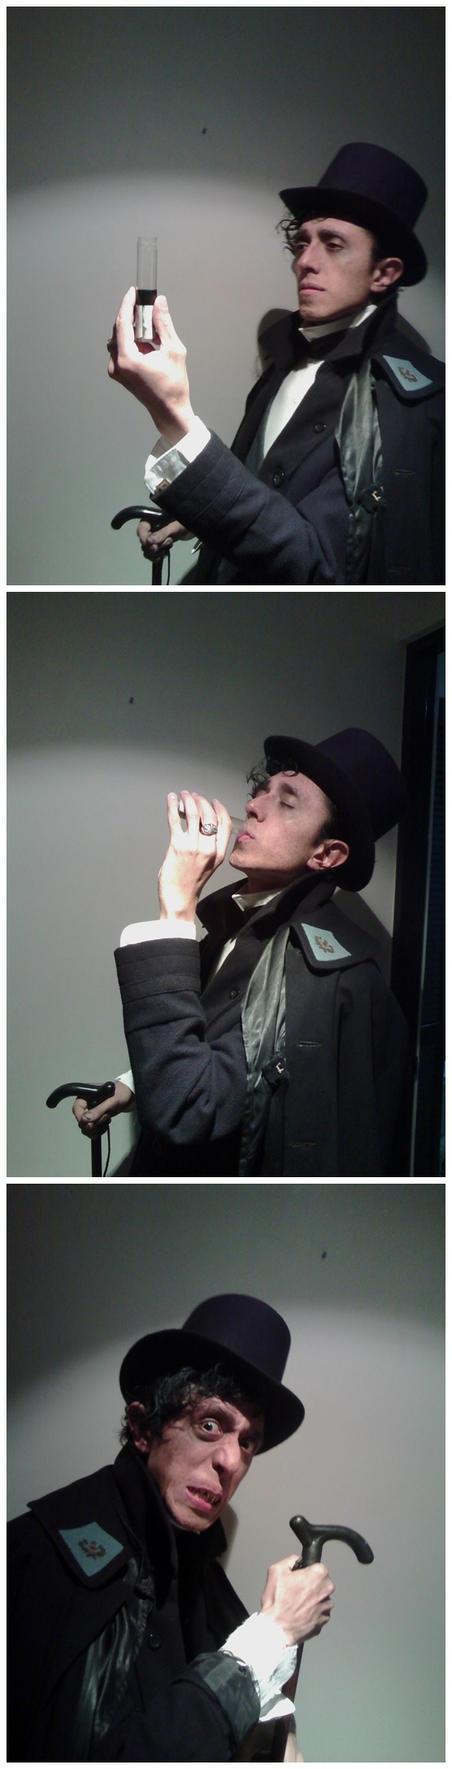 Jekyll and Hyde: transformation by trafalgarhero